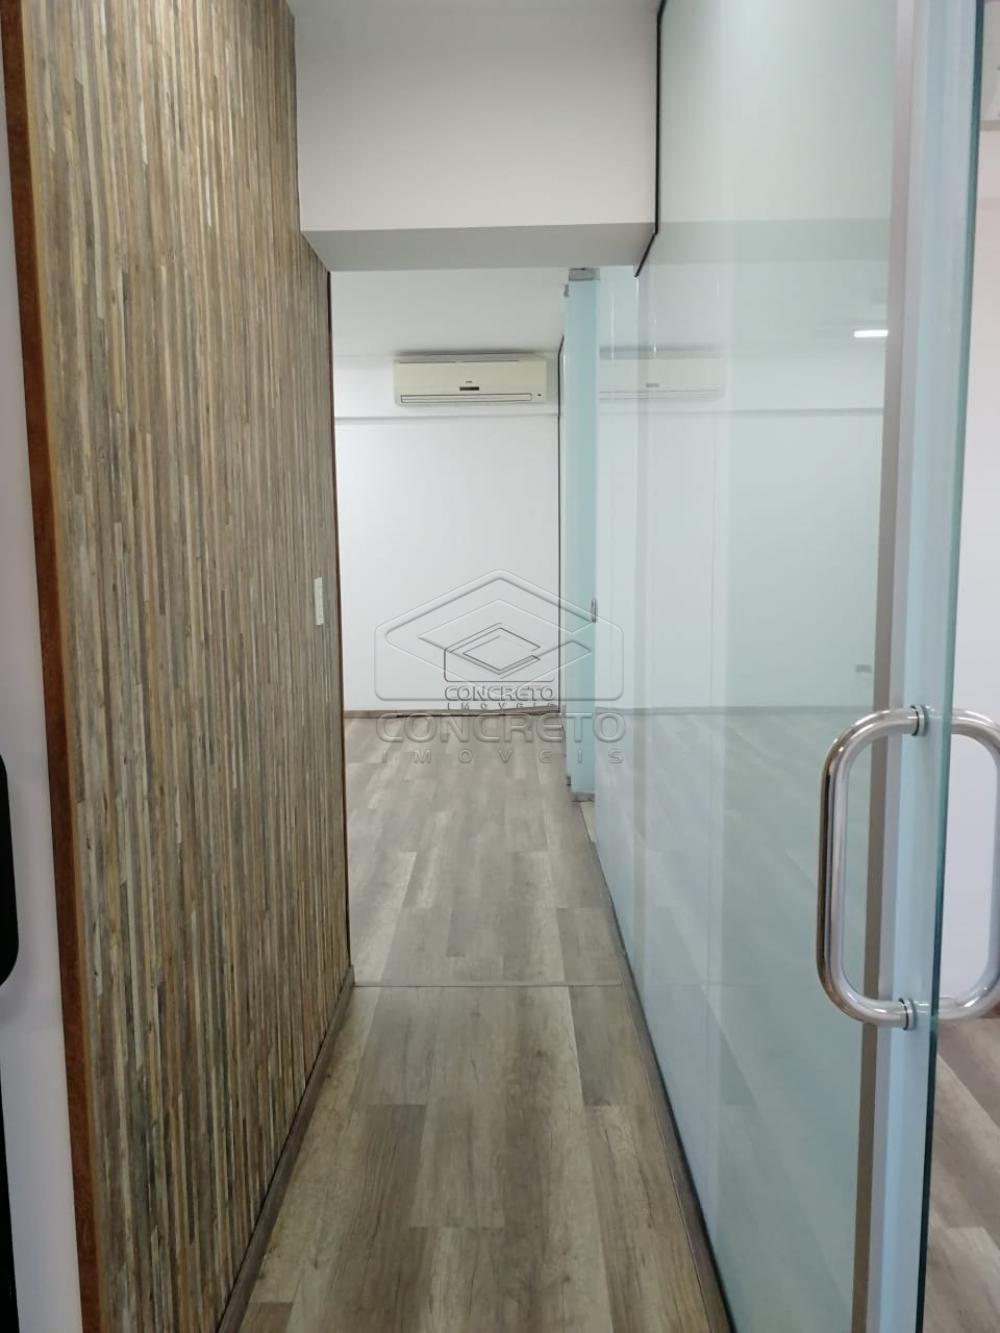 Alugar Comercial / Sala em Bauru apenas R$ 2.200,00 - Foto 7